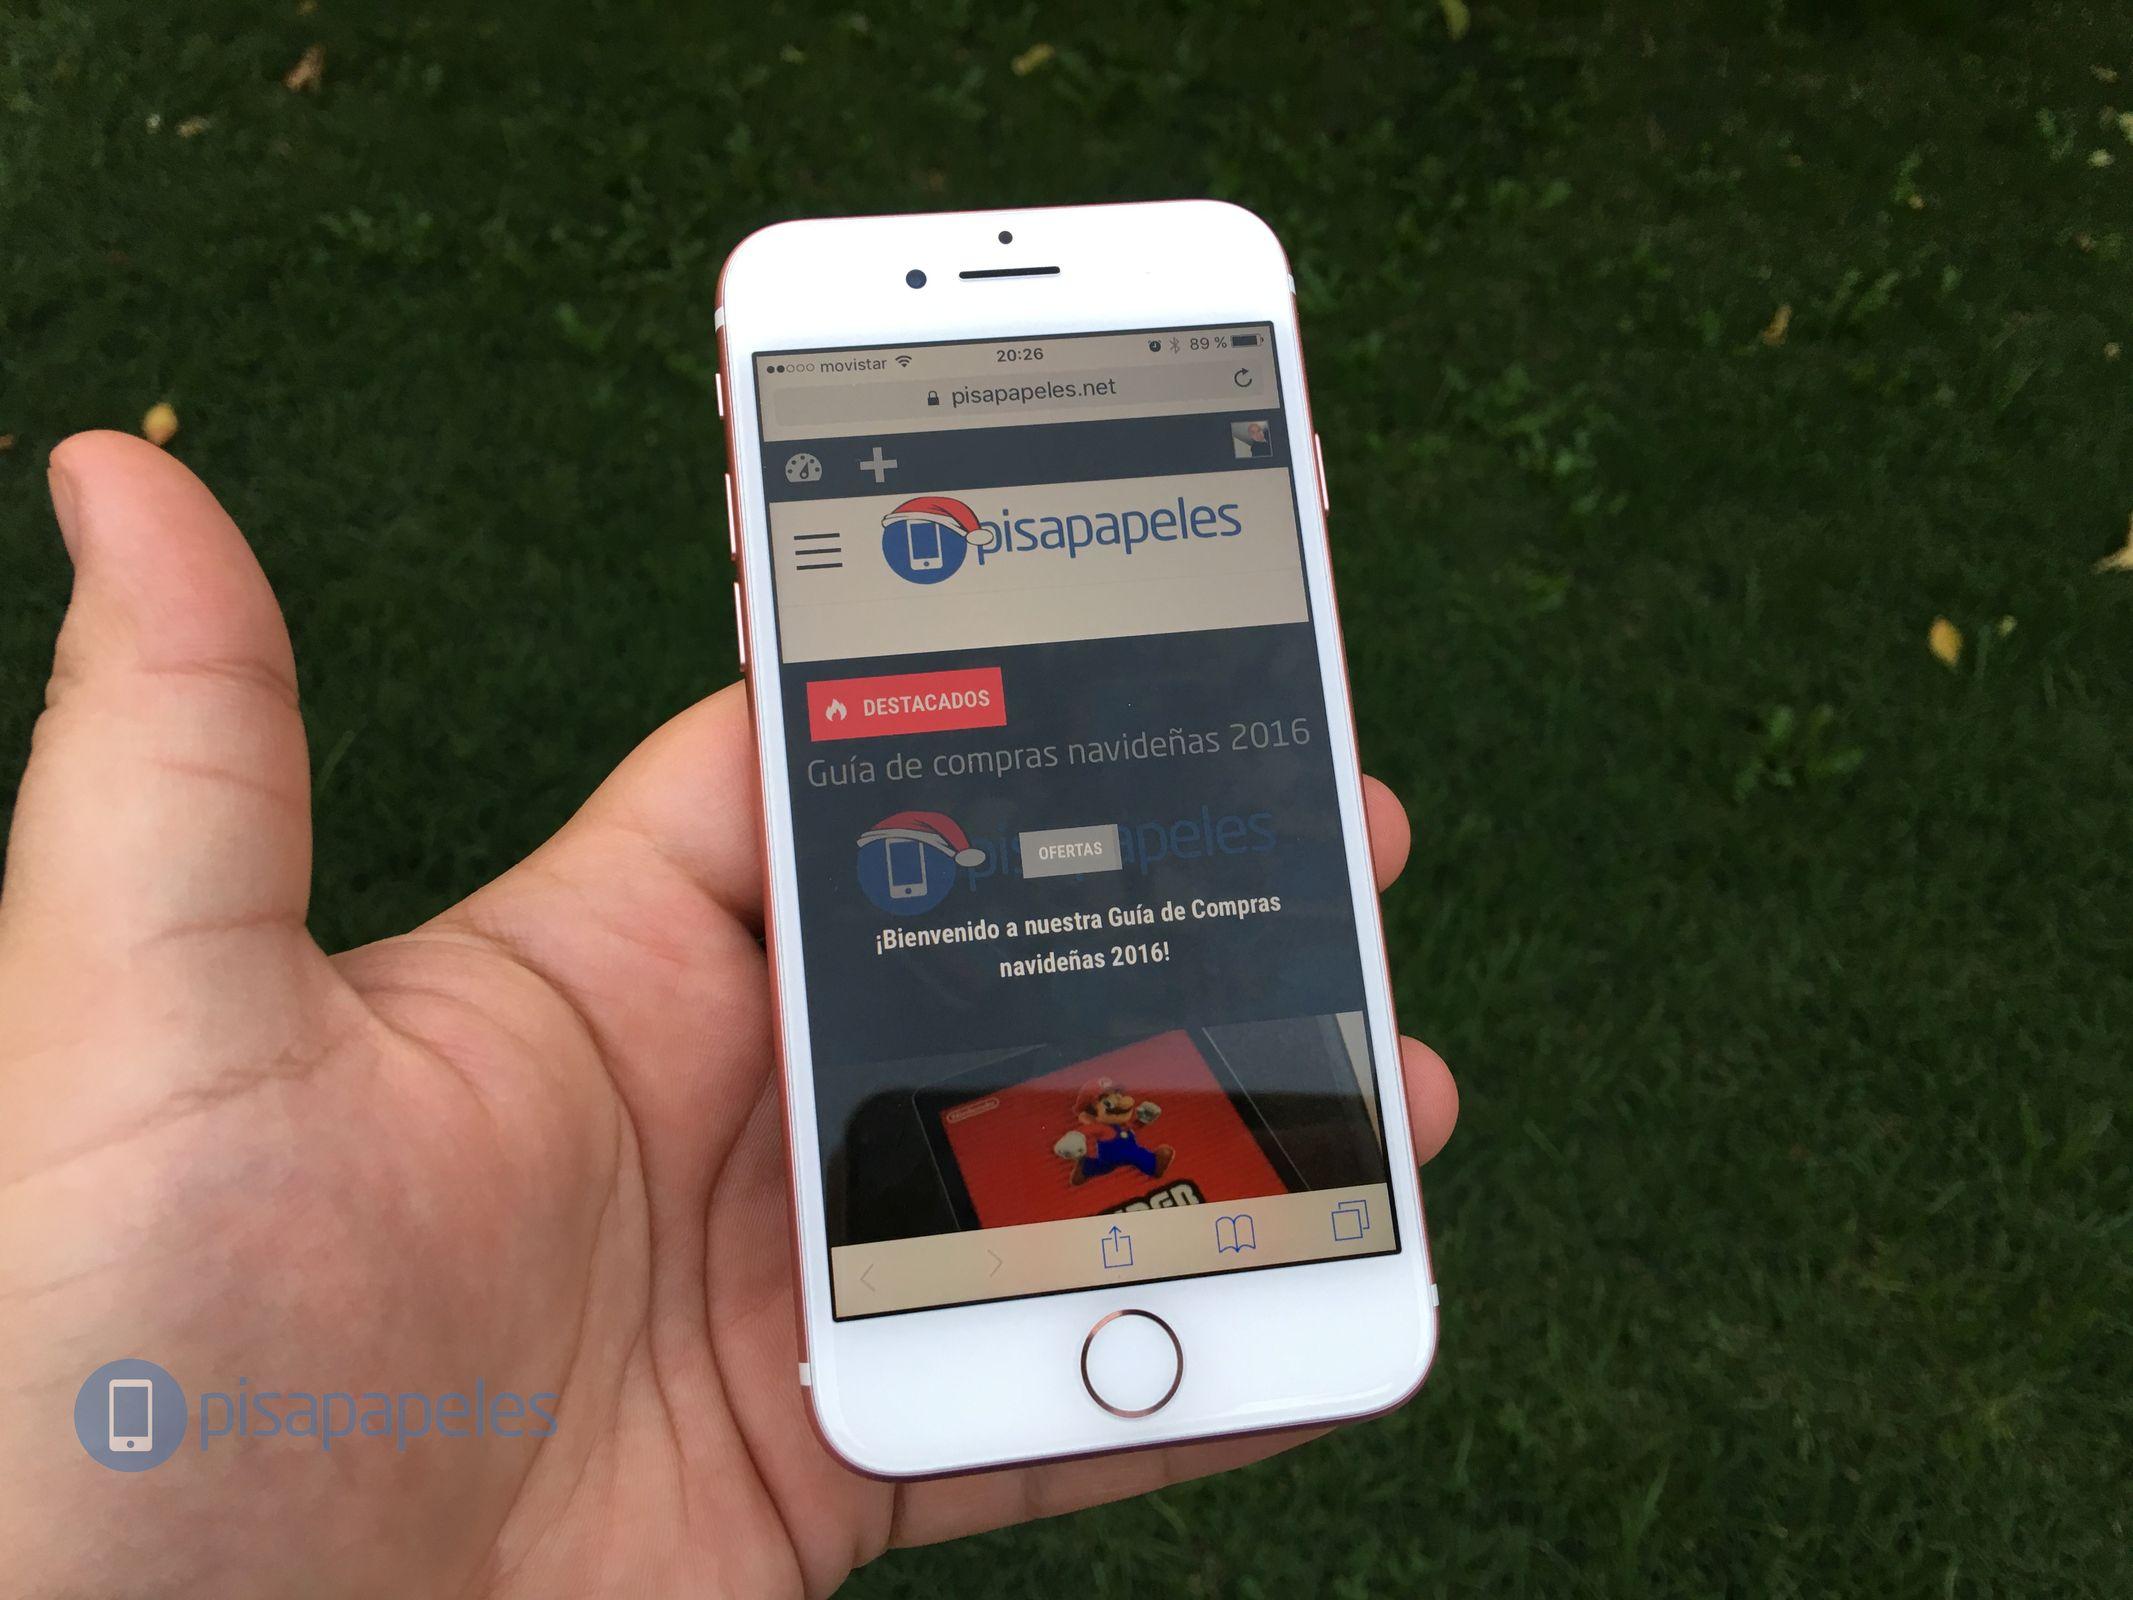 apple-iphone-7-pisapapeles-net_25